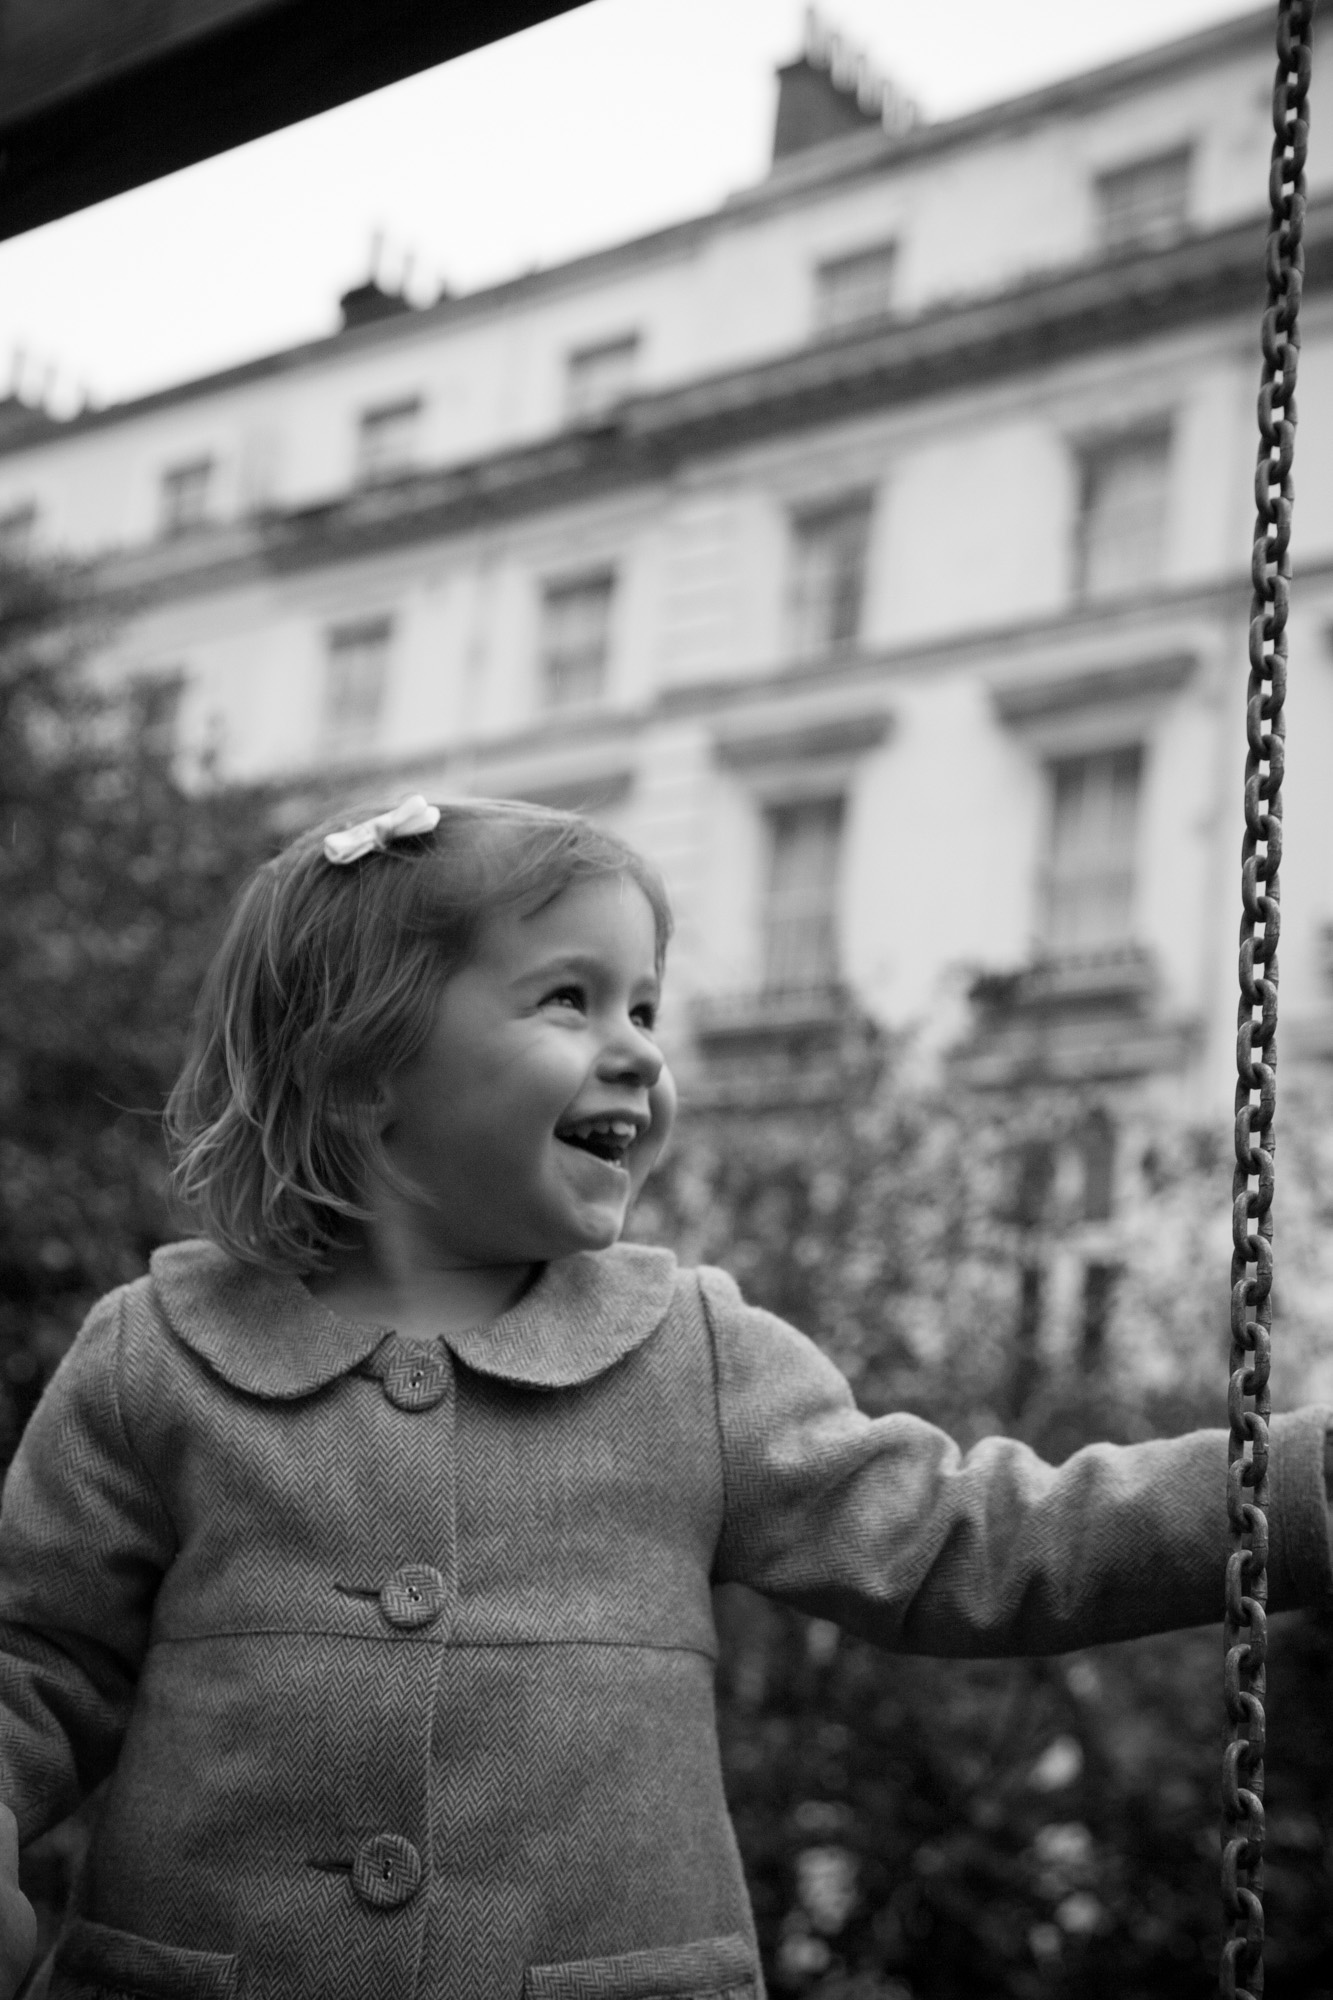 family-life-family-photographer-oxford-london-jonathan-self-photography-24.jpg